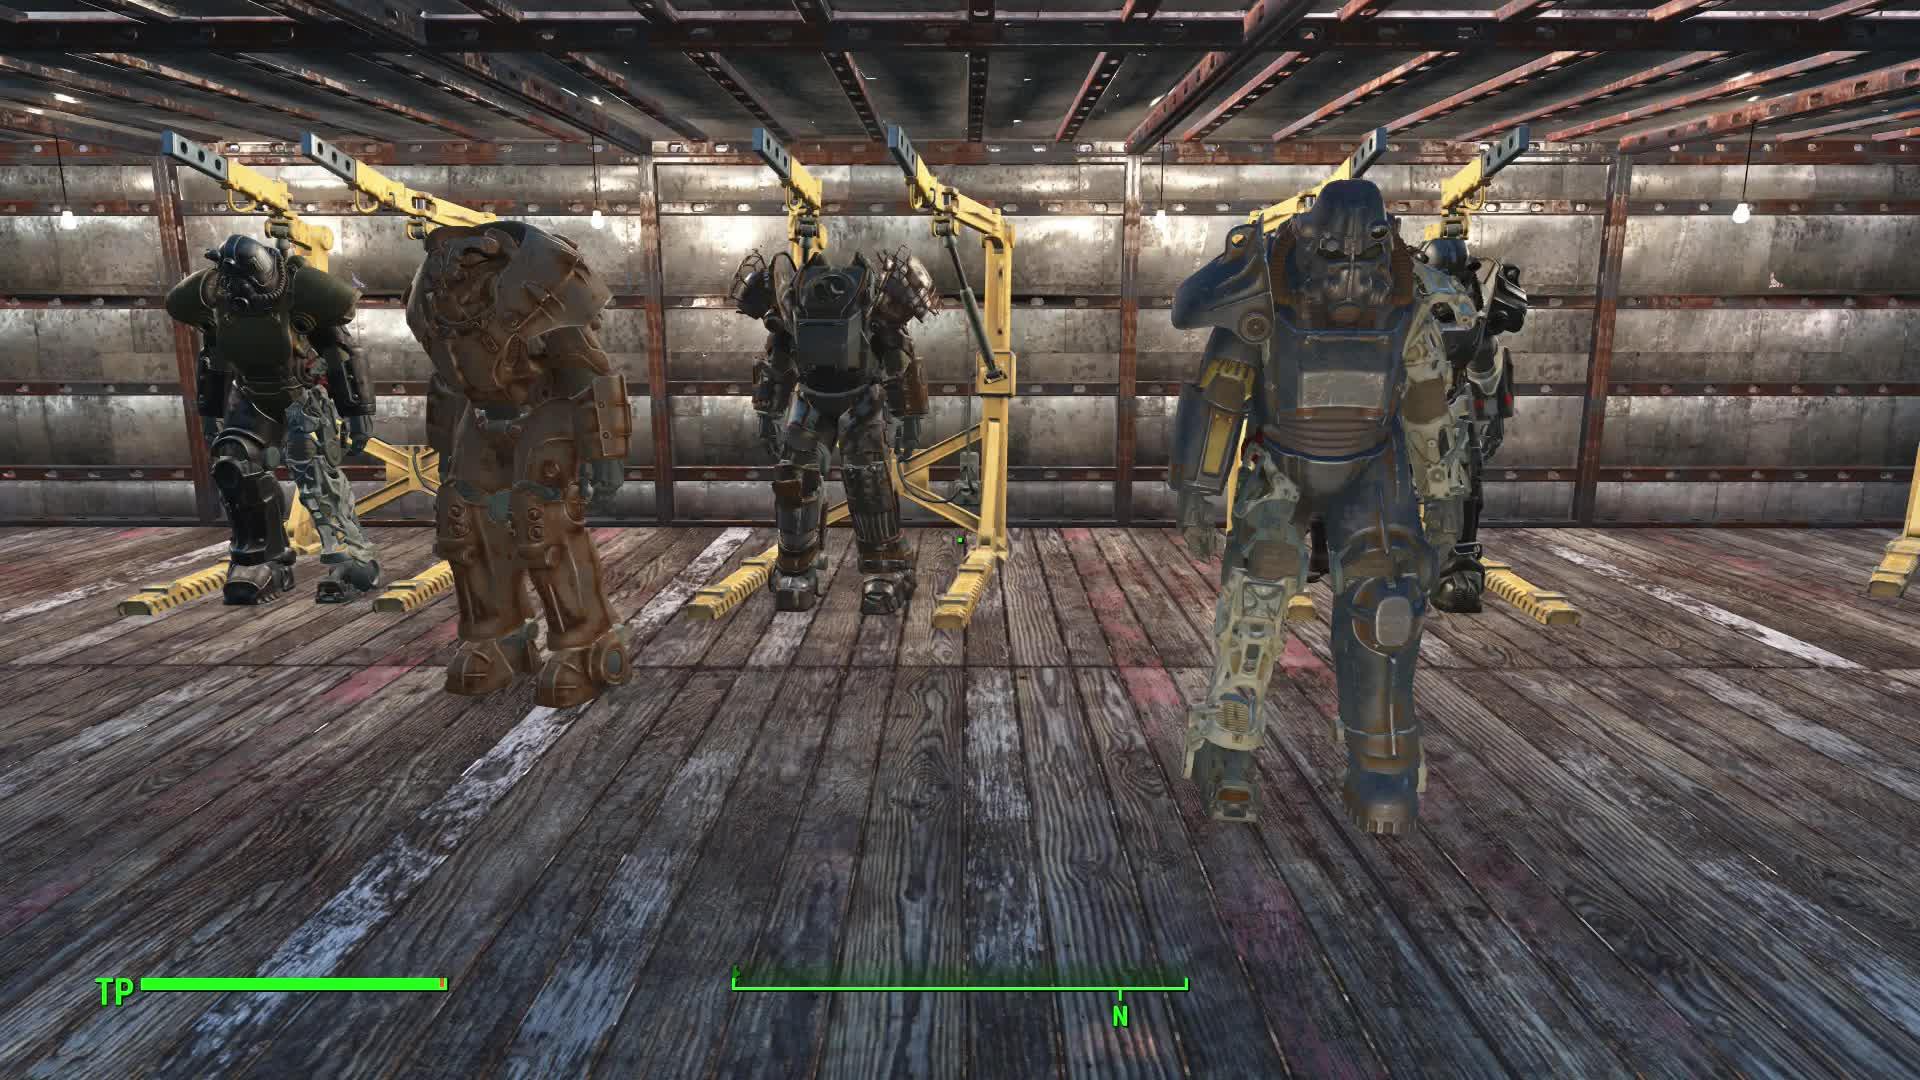 Fallout 4, wackelpuppen, fallout-Area